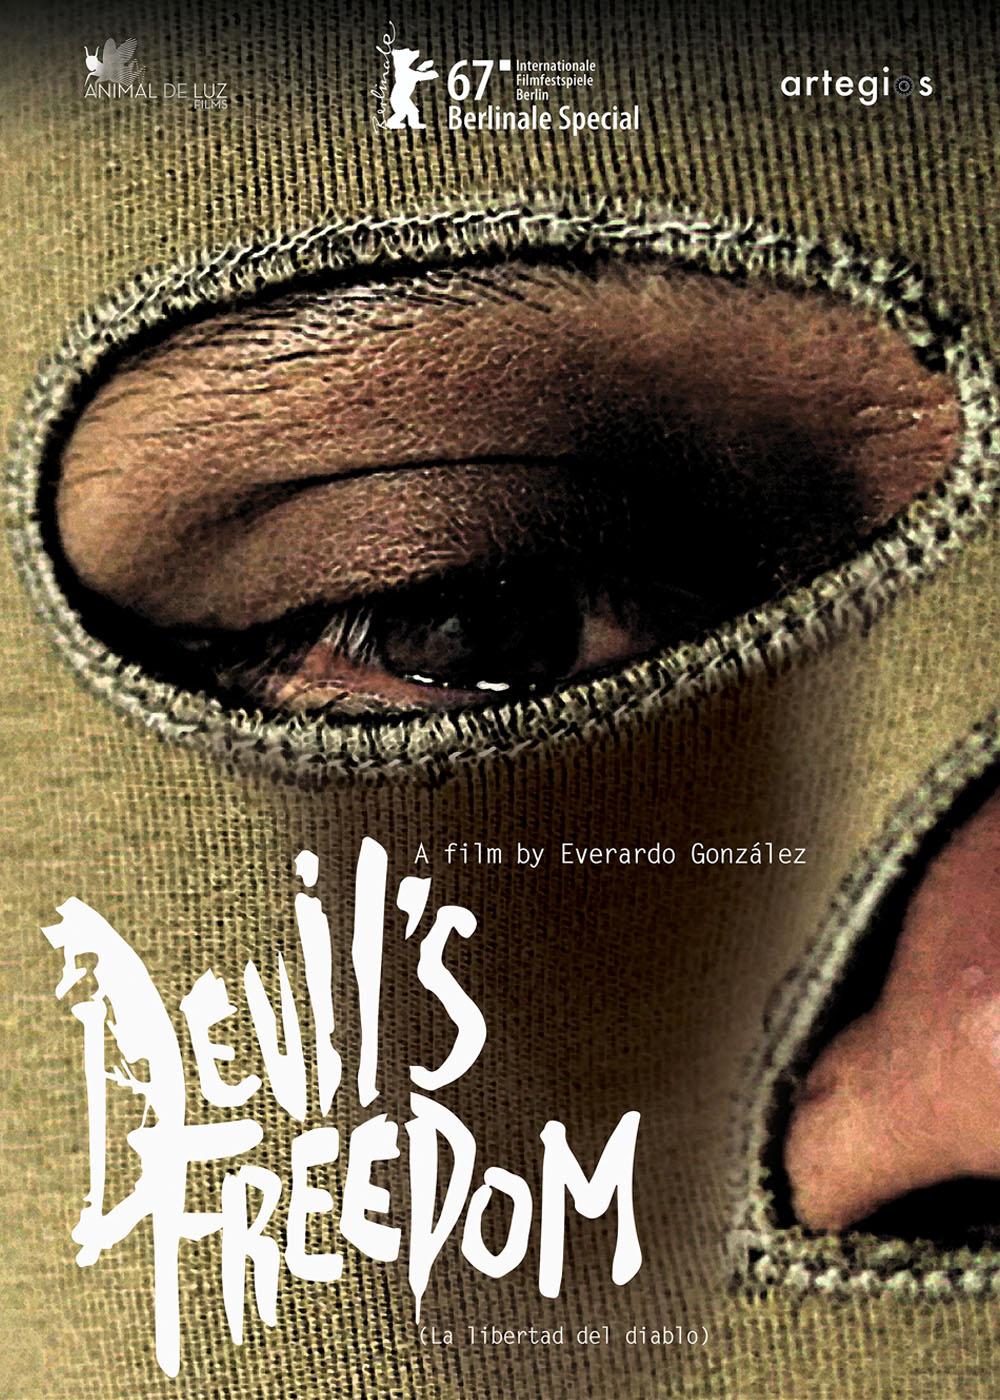 devilsfreedom_poster.jpg